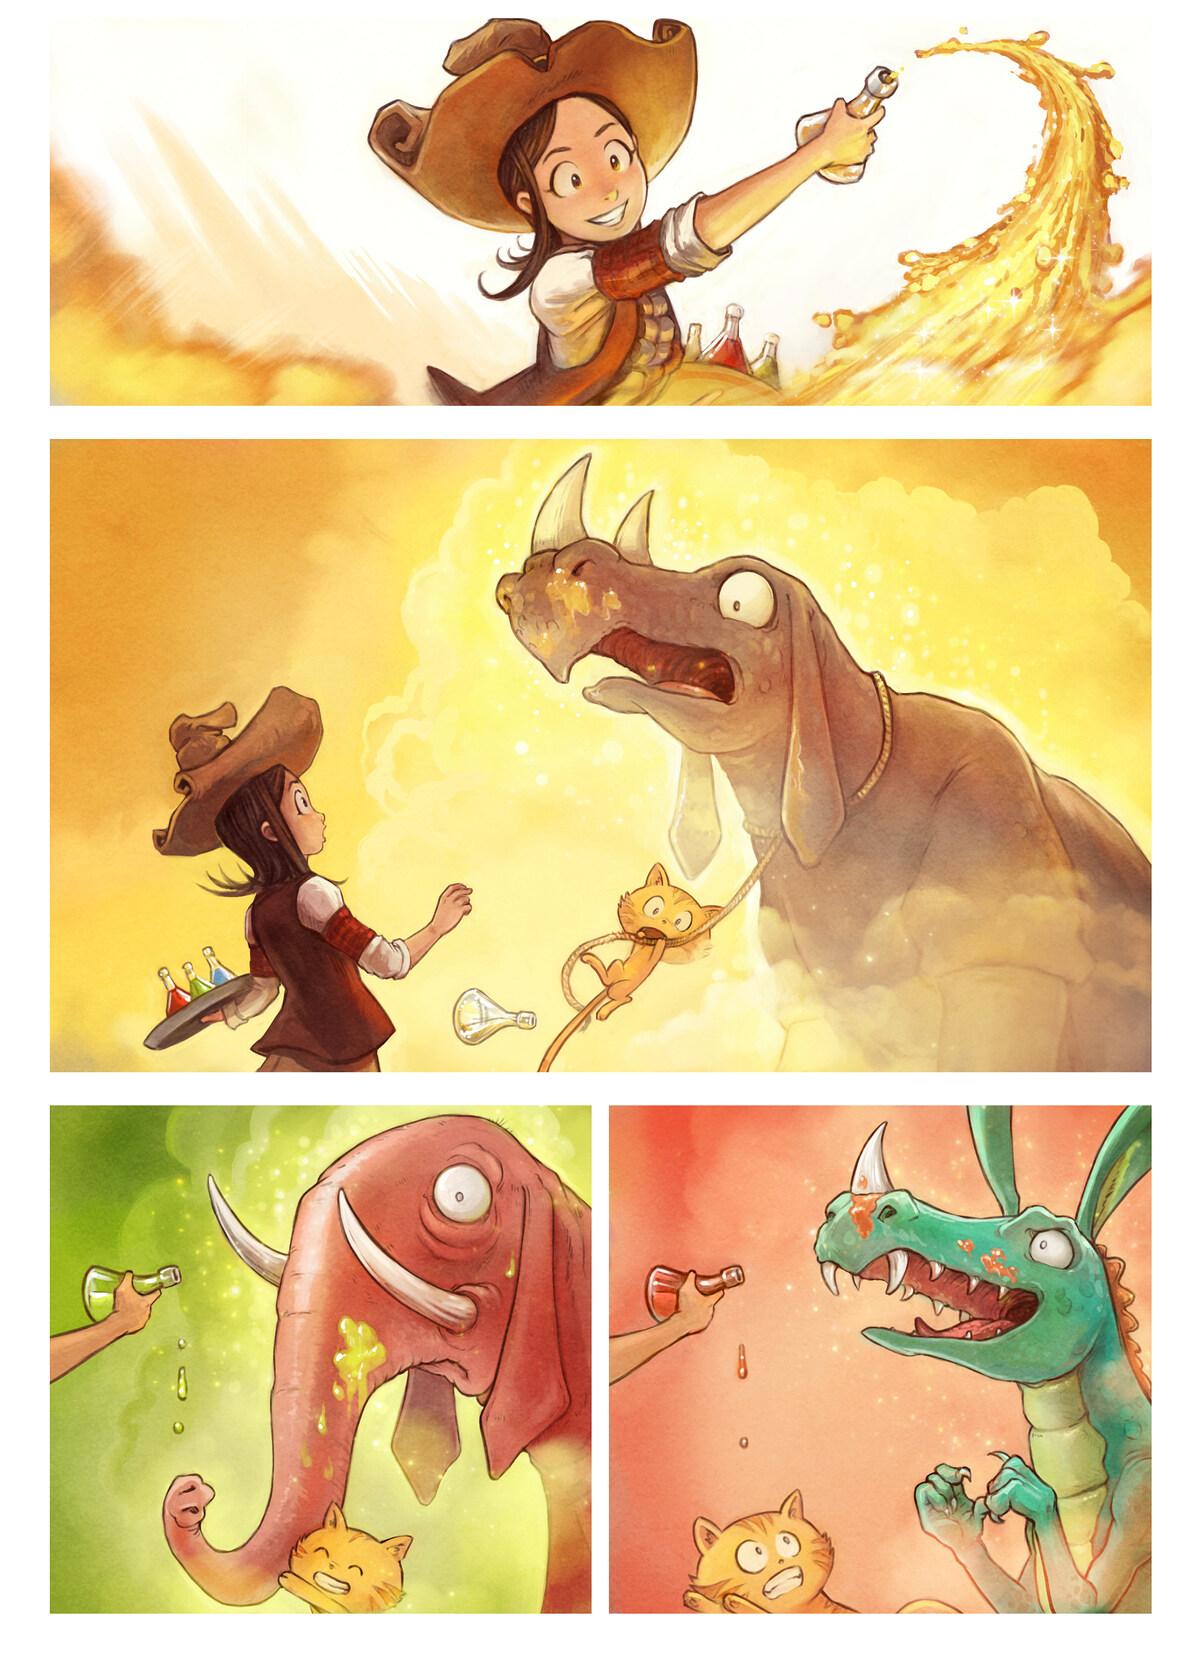 A webcomic page of Pepper&Carrot, pagbu 20 [jb], papri 4